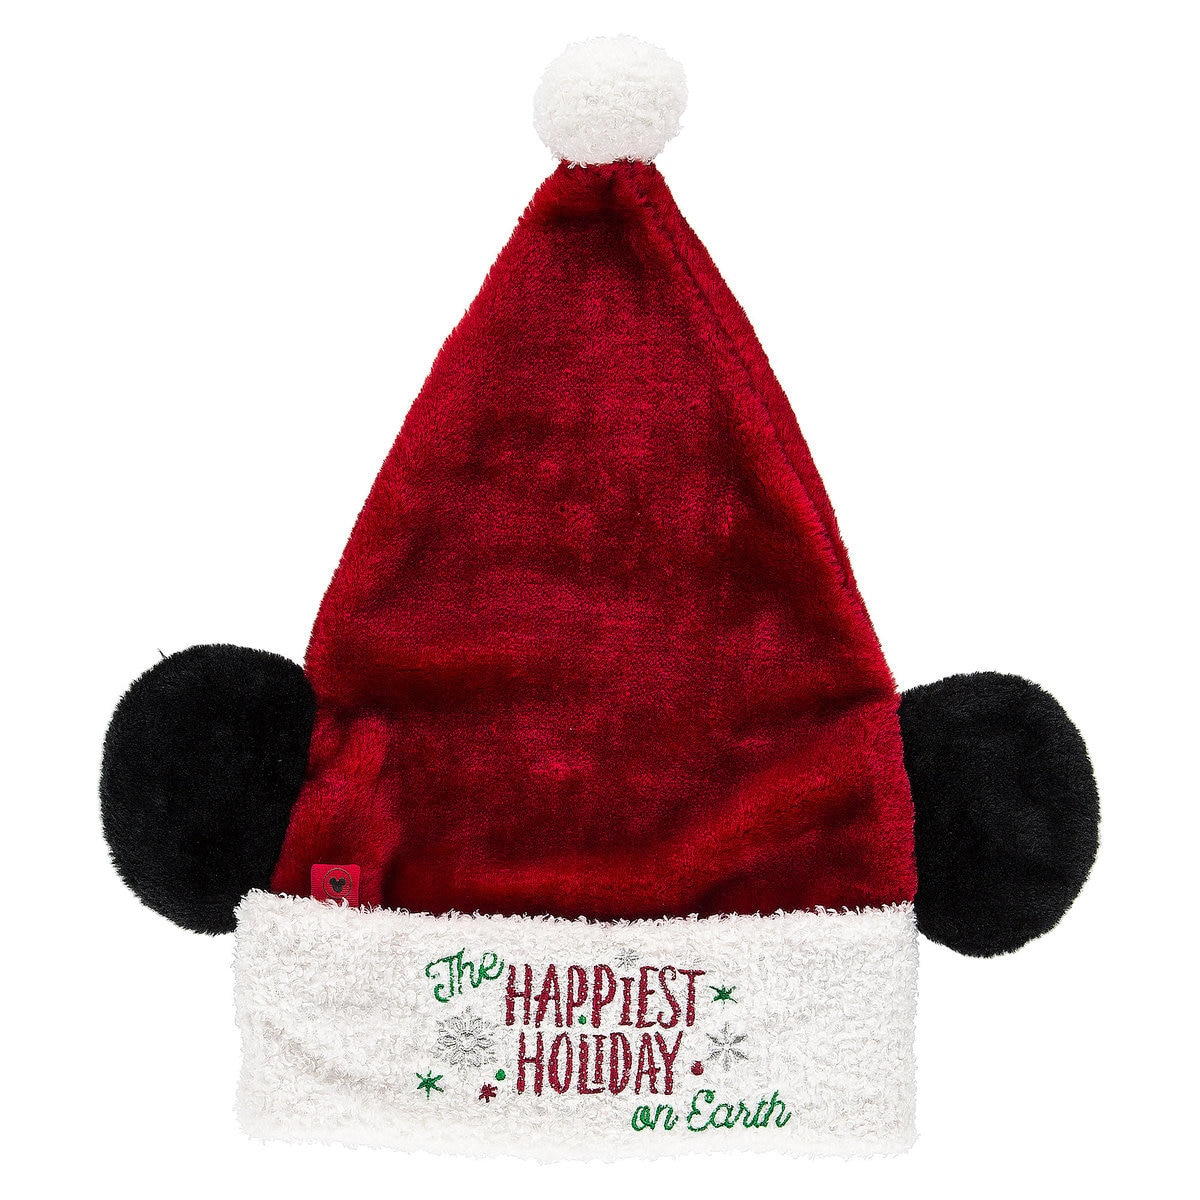 65bf4c0875636 Disney Santa Hat - Santa Mickey Mouse Ear Hat - Happiest Holiday